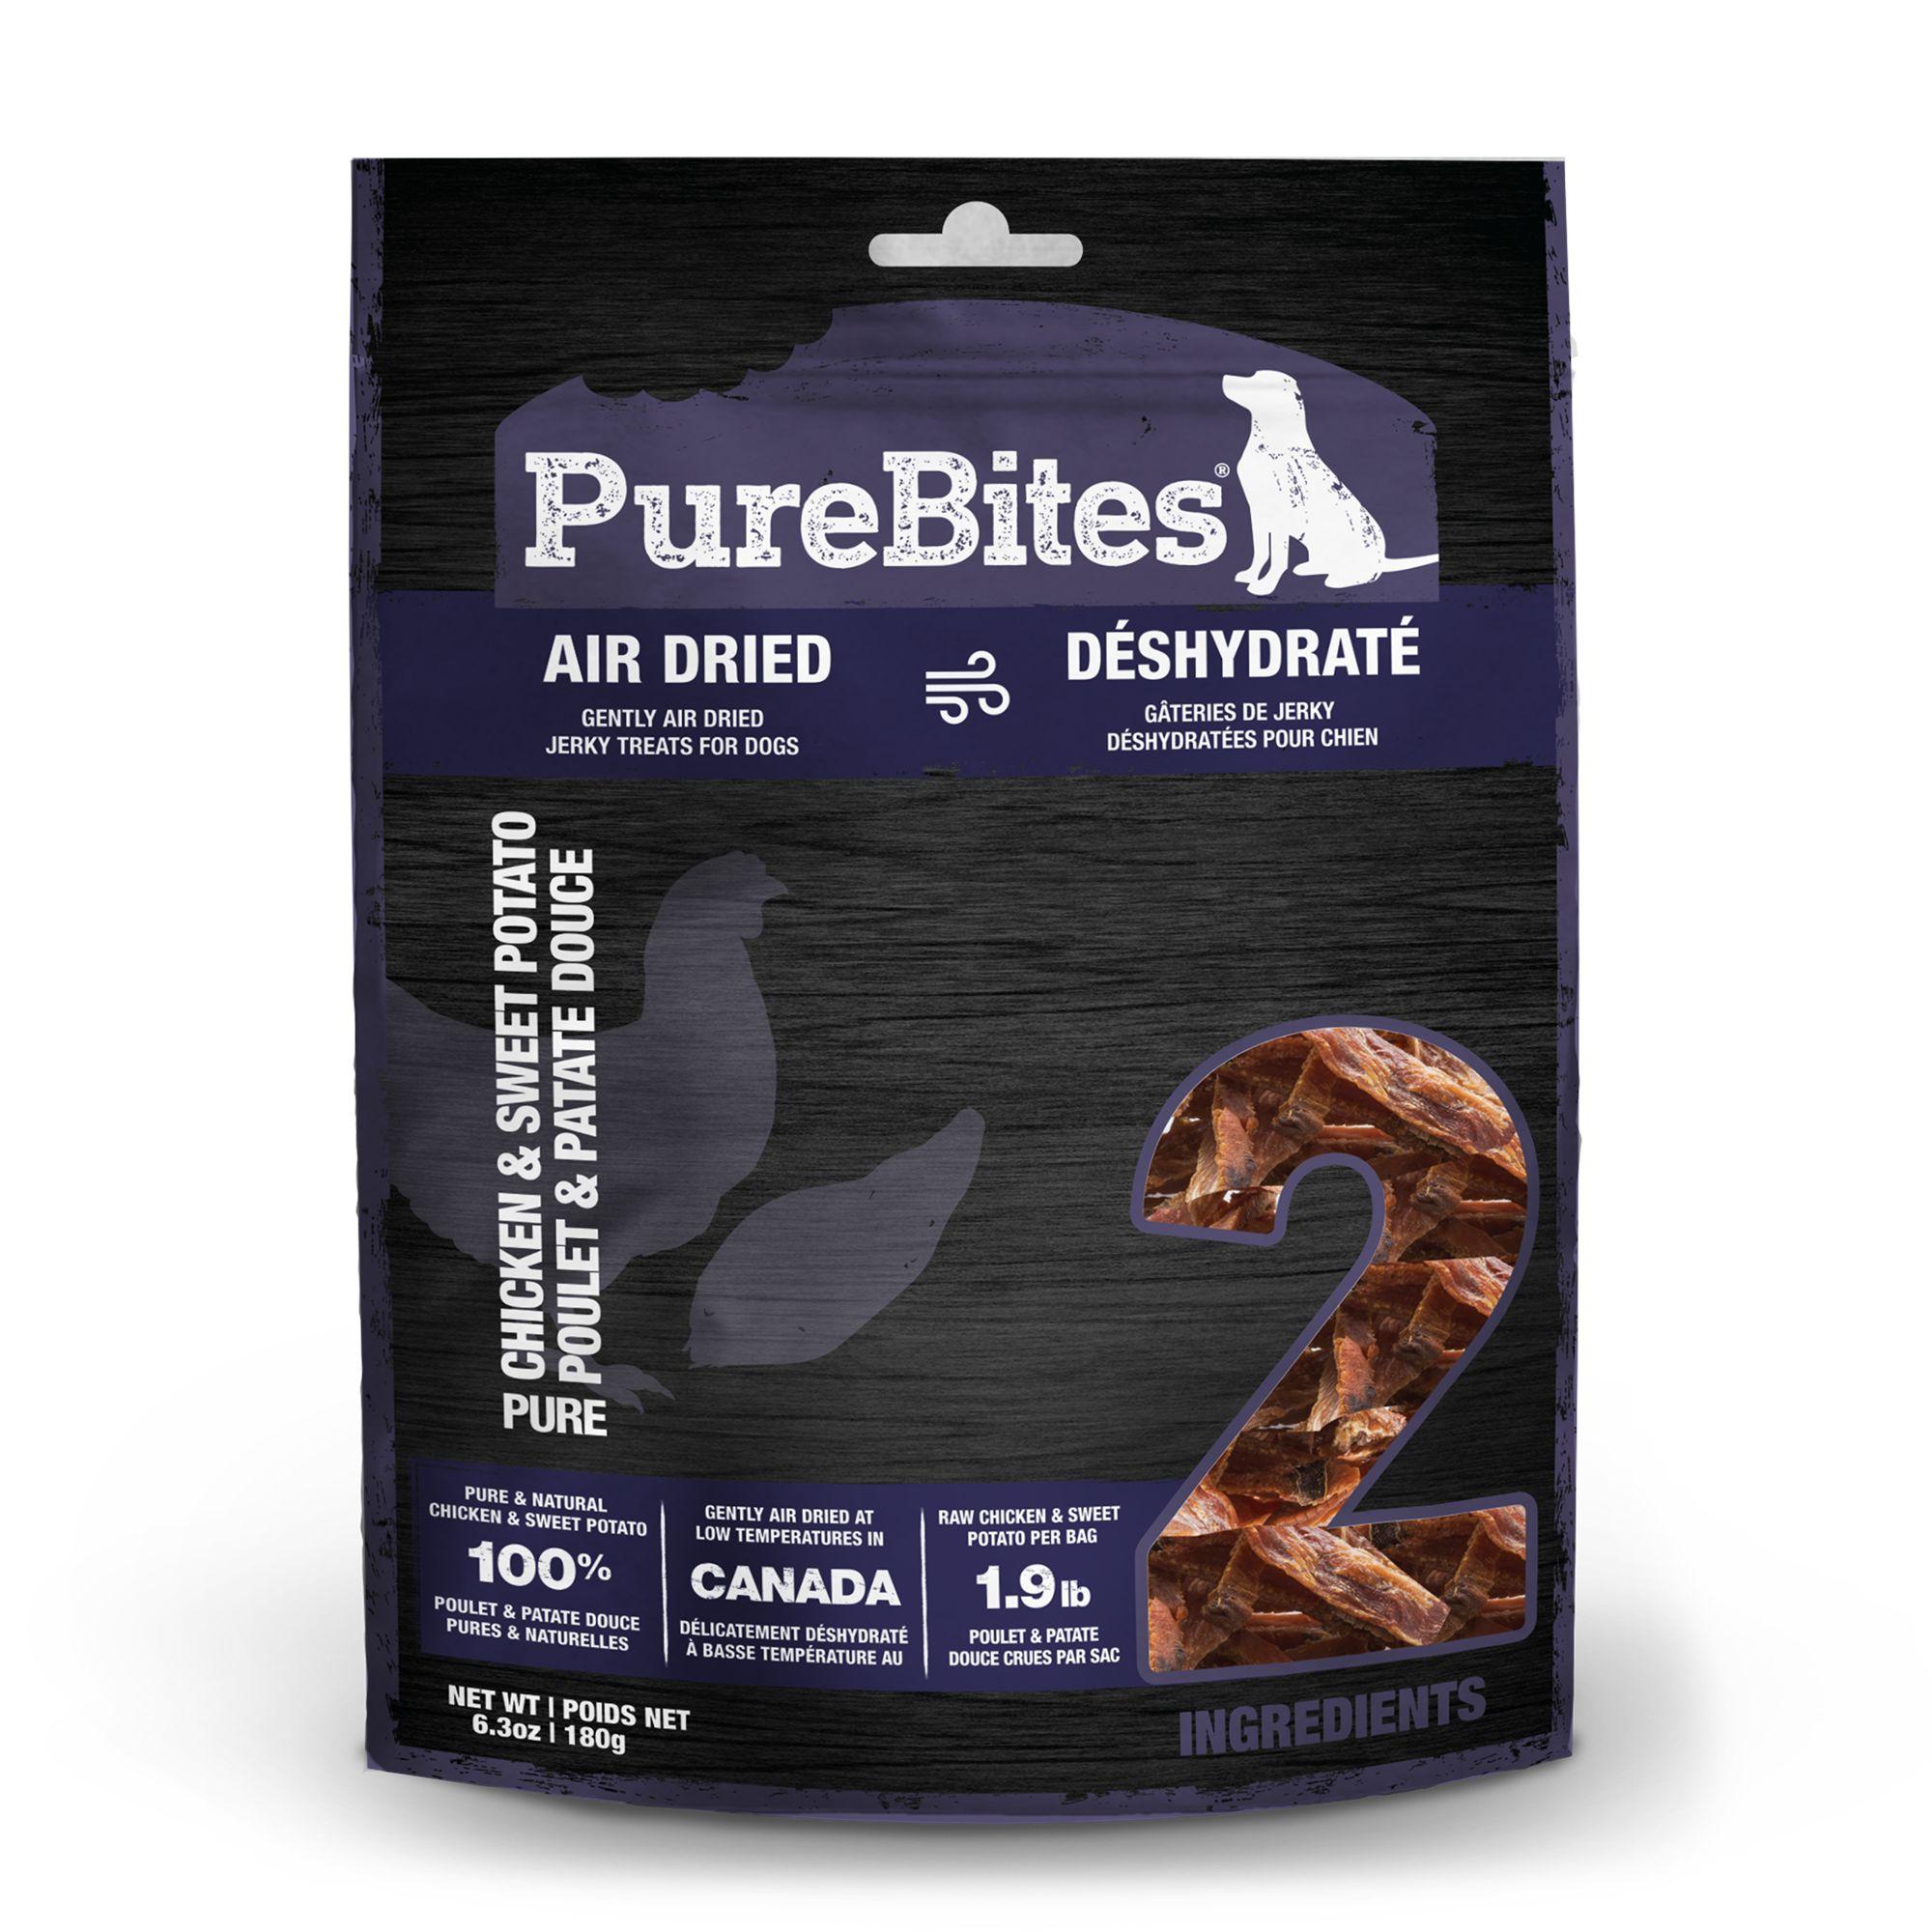 PureBites Jerky Dog Treat - Natural, Chicken and Sweet Potato size: 6.3 Oz, Chicken & Sweet Potato, Dry, Chicken Breast 5265862